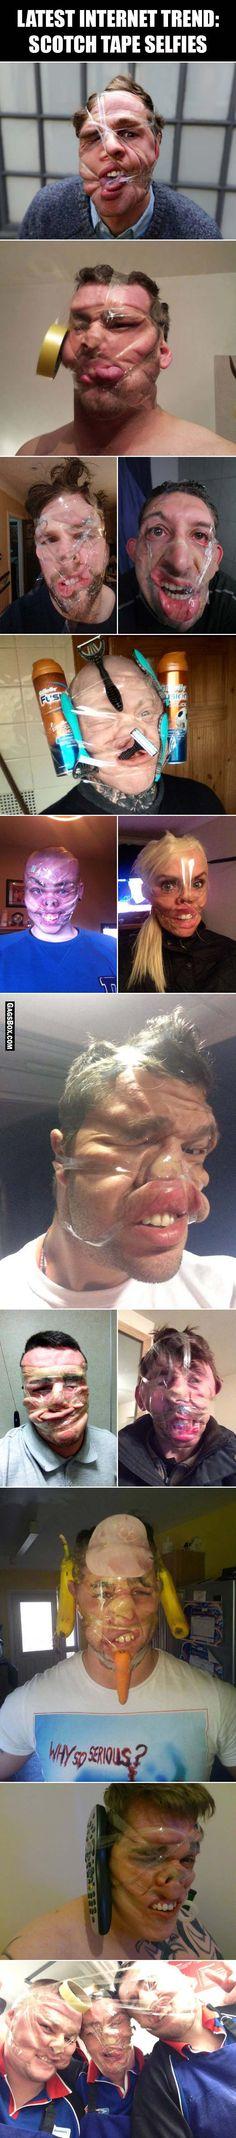 Latest internet trend - scotch tape selfies - #funny, #lol, #fun, #humor, #comics, #meme, #gag, #box, #lolpics, #Funnypics, #GagsBox,